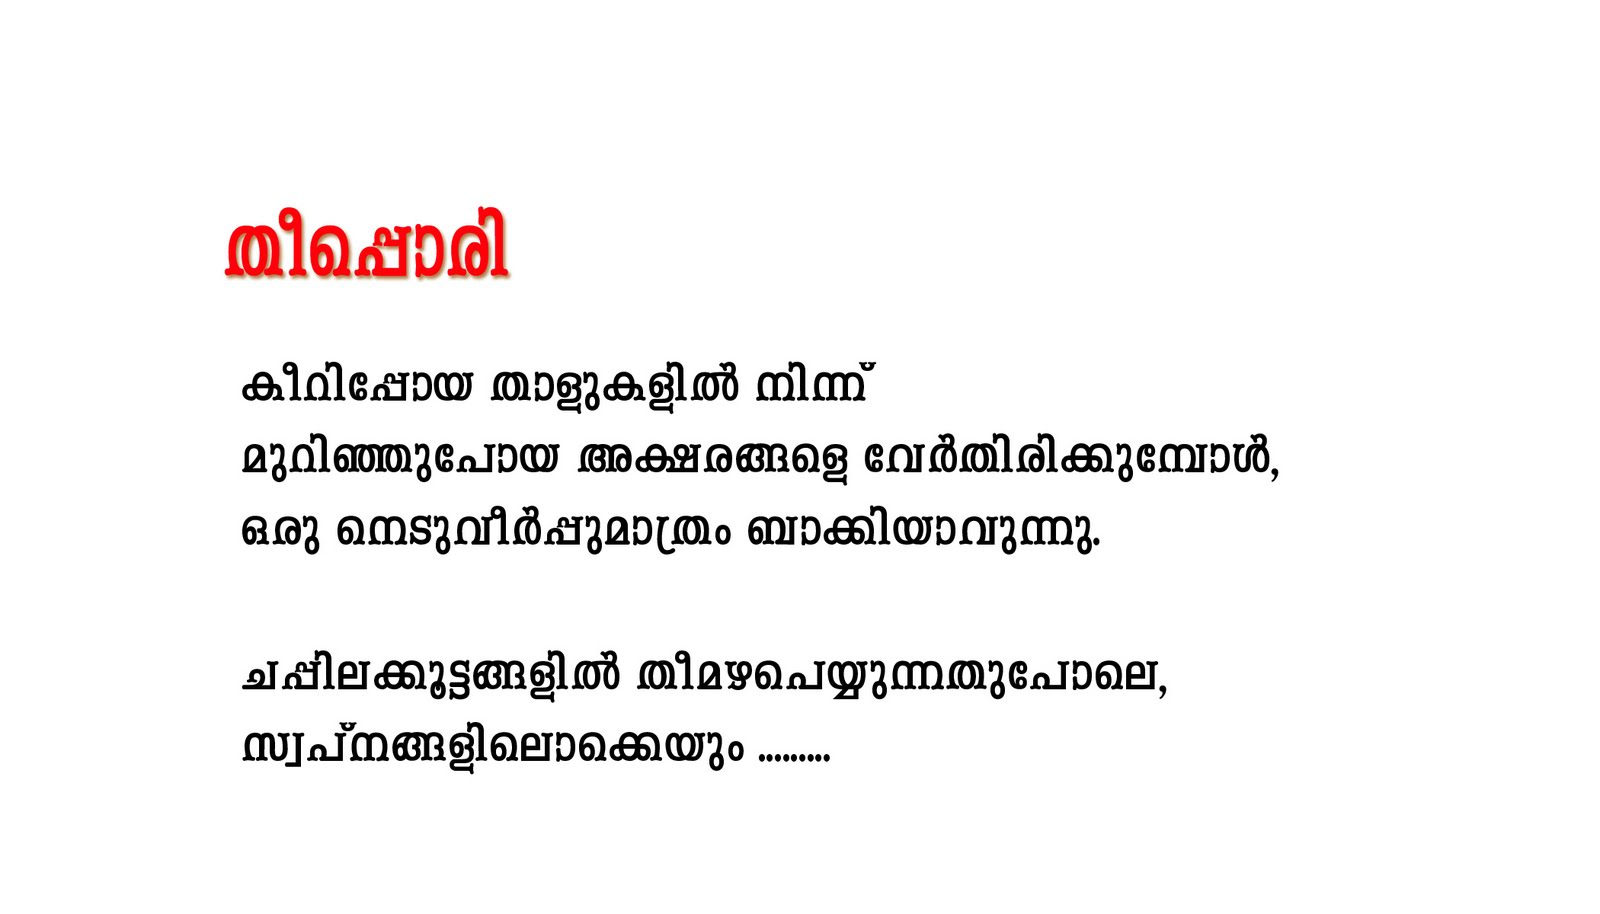 Malayalam kavithakal sad mp3 downloads | mp3 download.